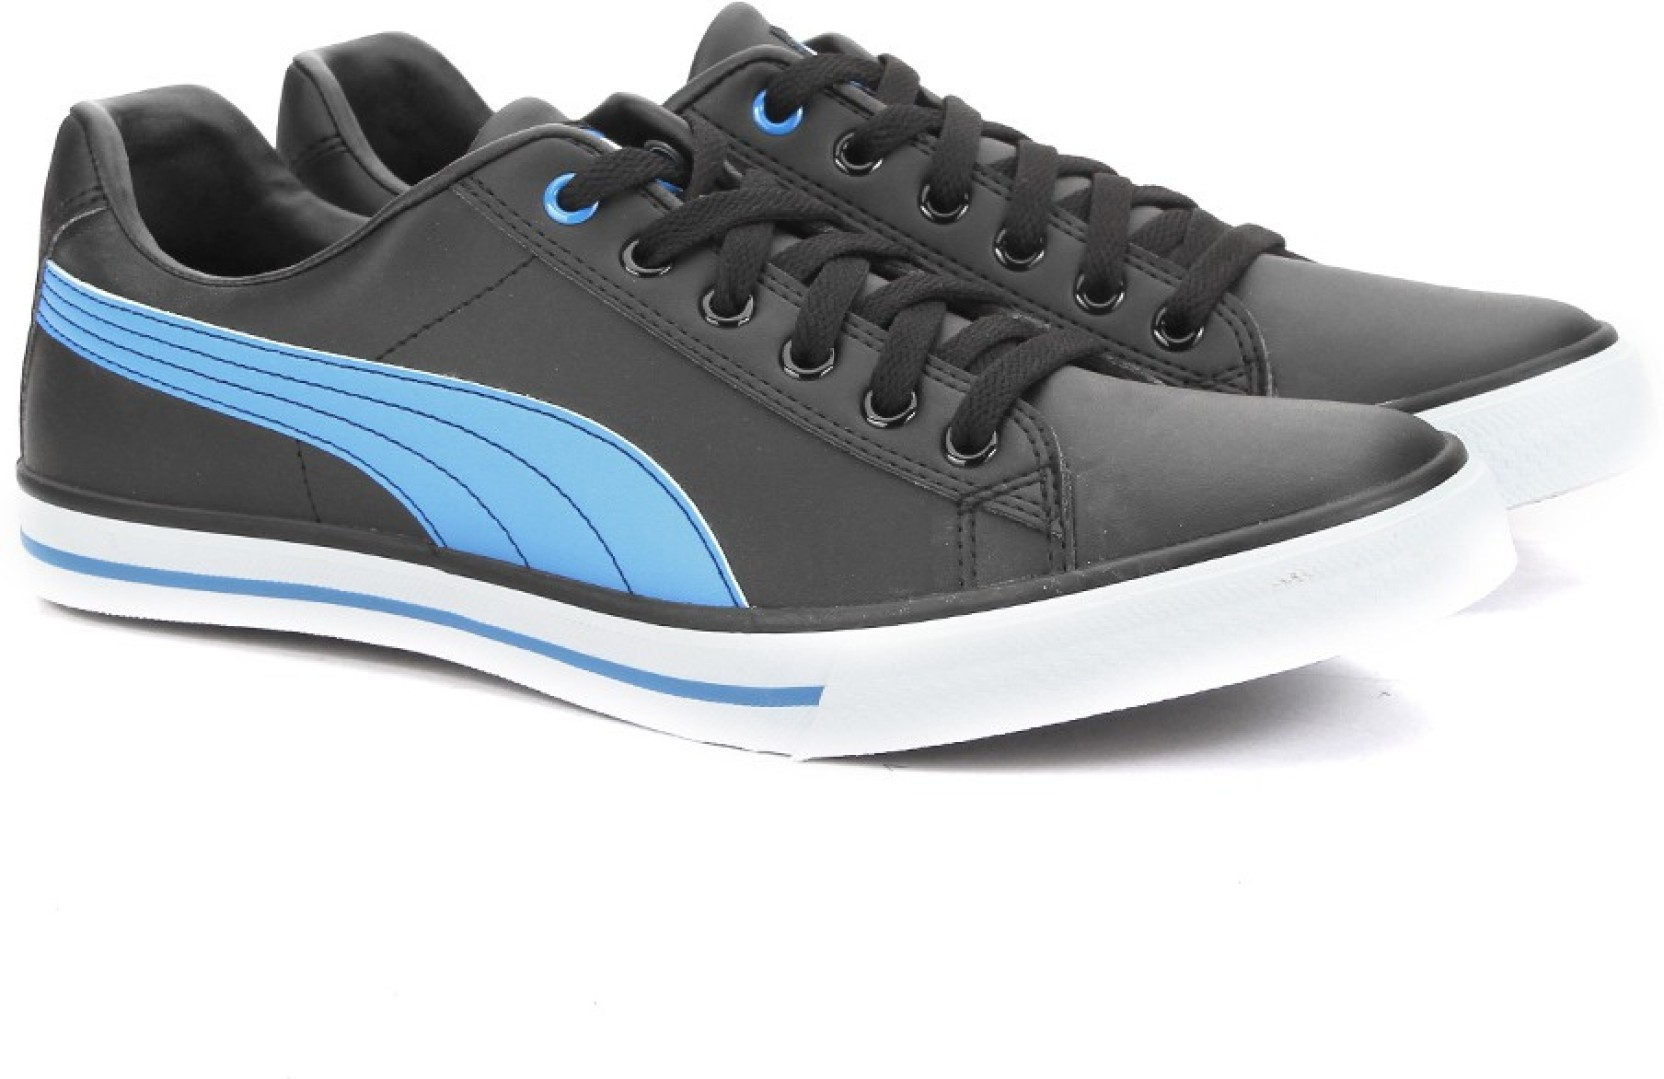 Puma Salz Iii Dp Sneakers Buy Puma Black French Blue